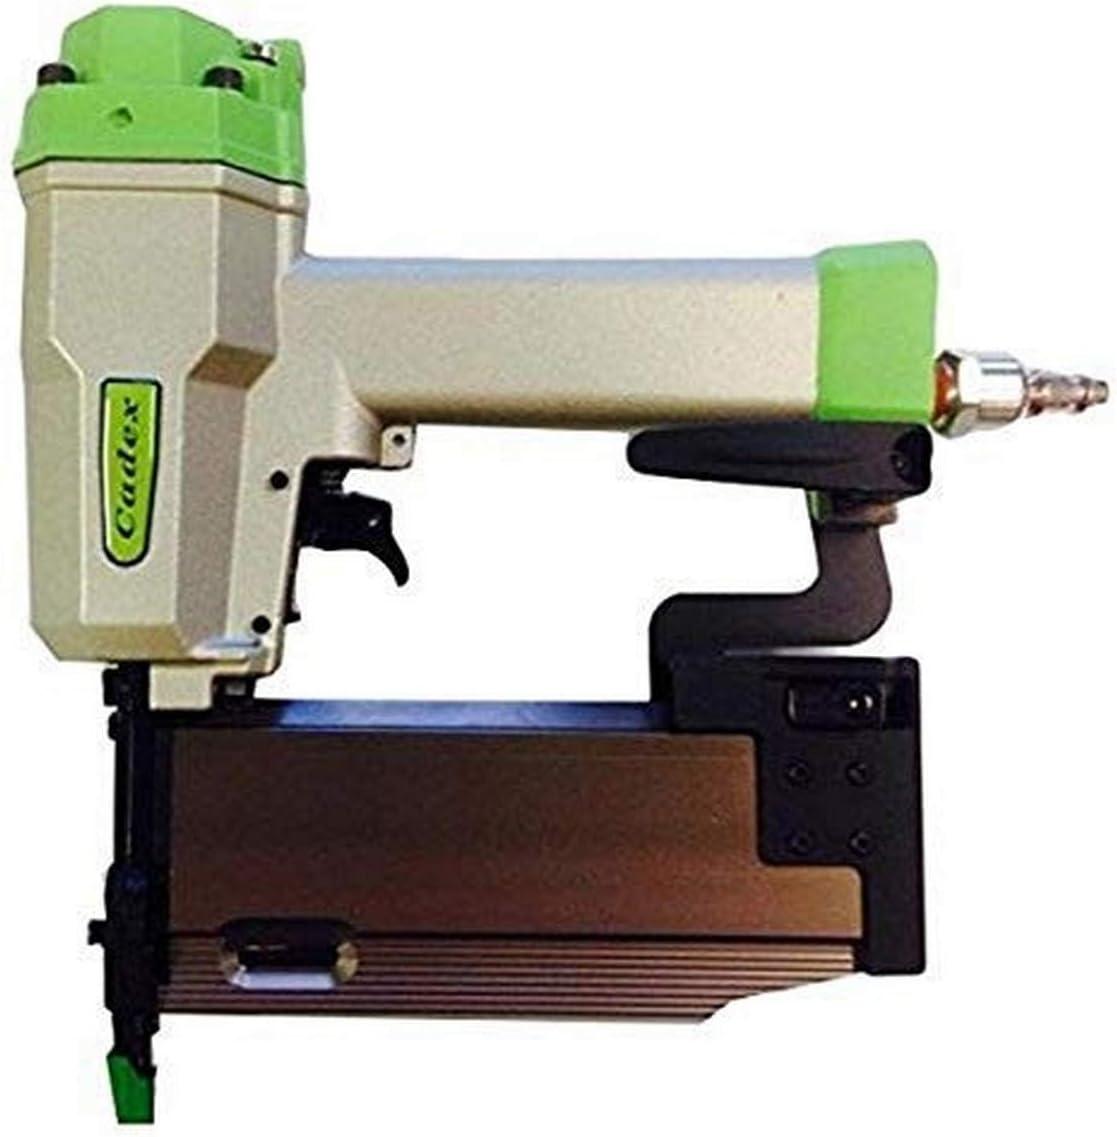 1//2-1-3//8 Cadex V1//18.35-SYS 18 Gauge Brad Nailer C//W Systainer Case